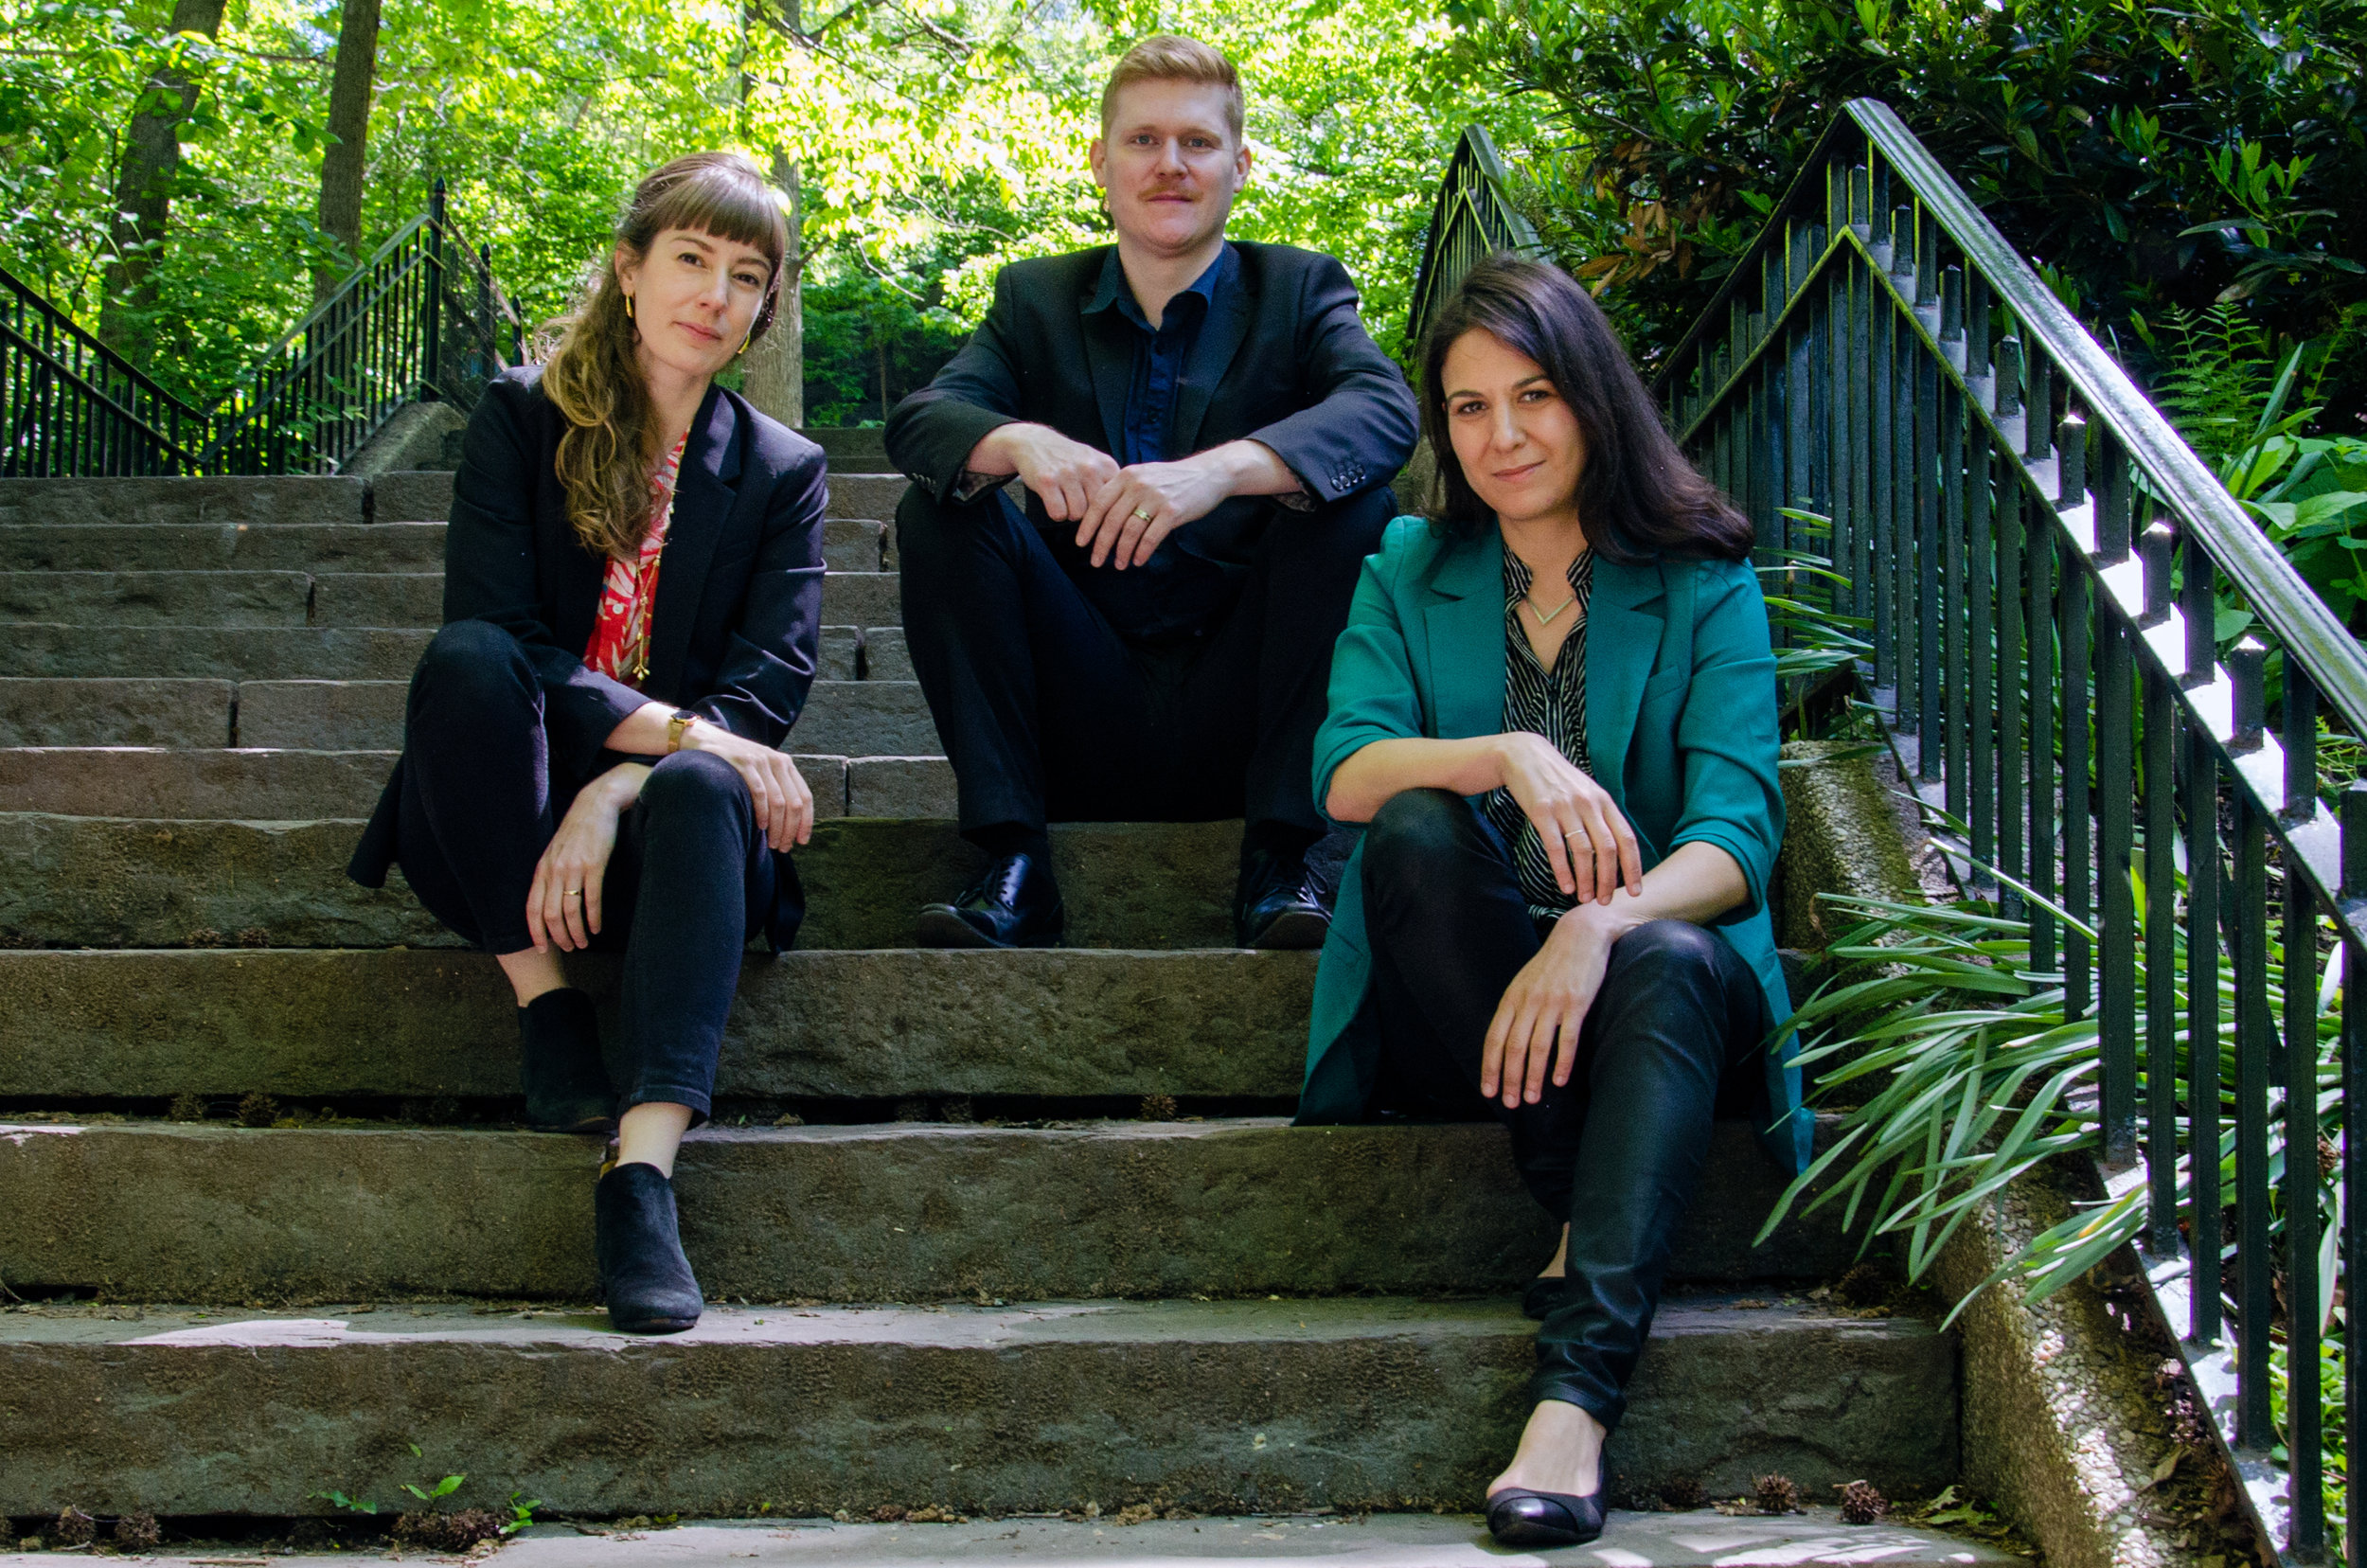 Kylwyria: pianist Julia Den Boer, hornist John Gattis and violinist Erica Dicker.